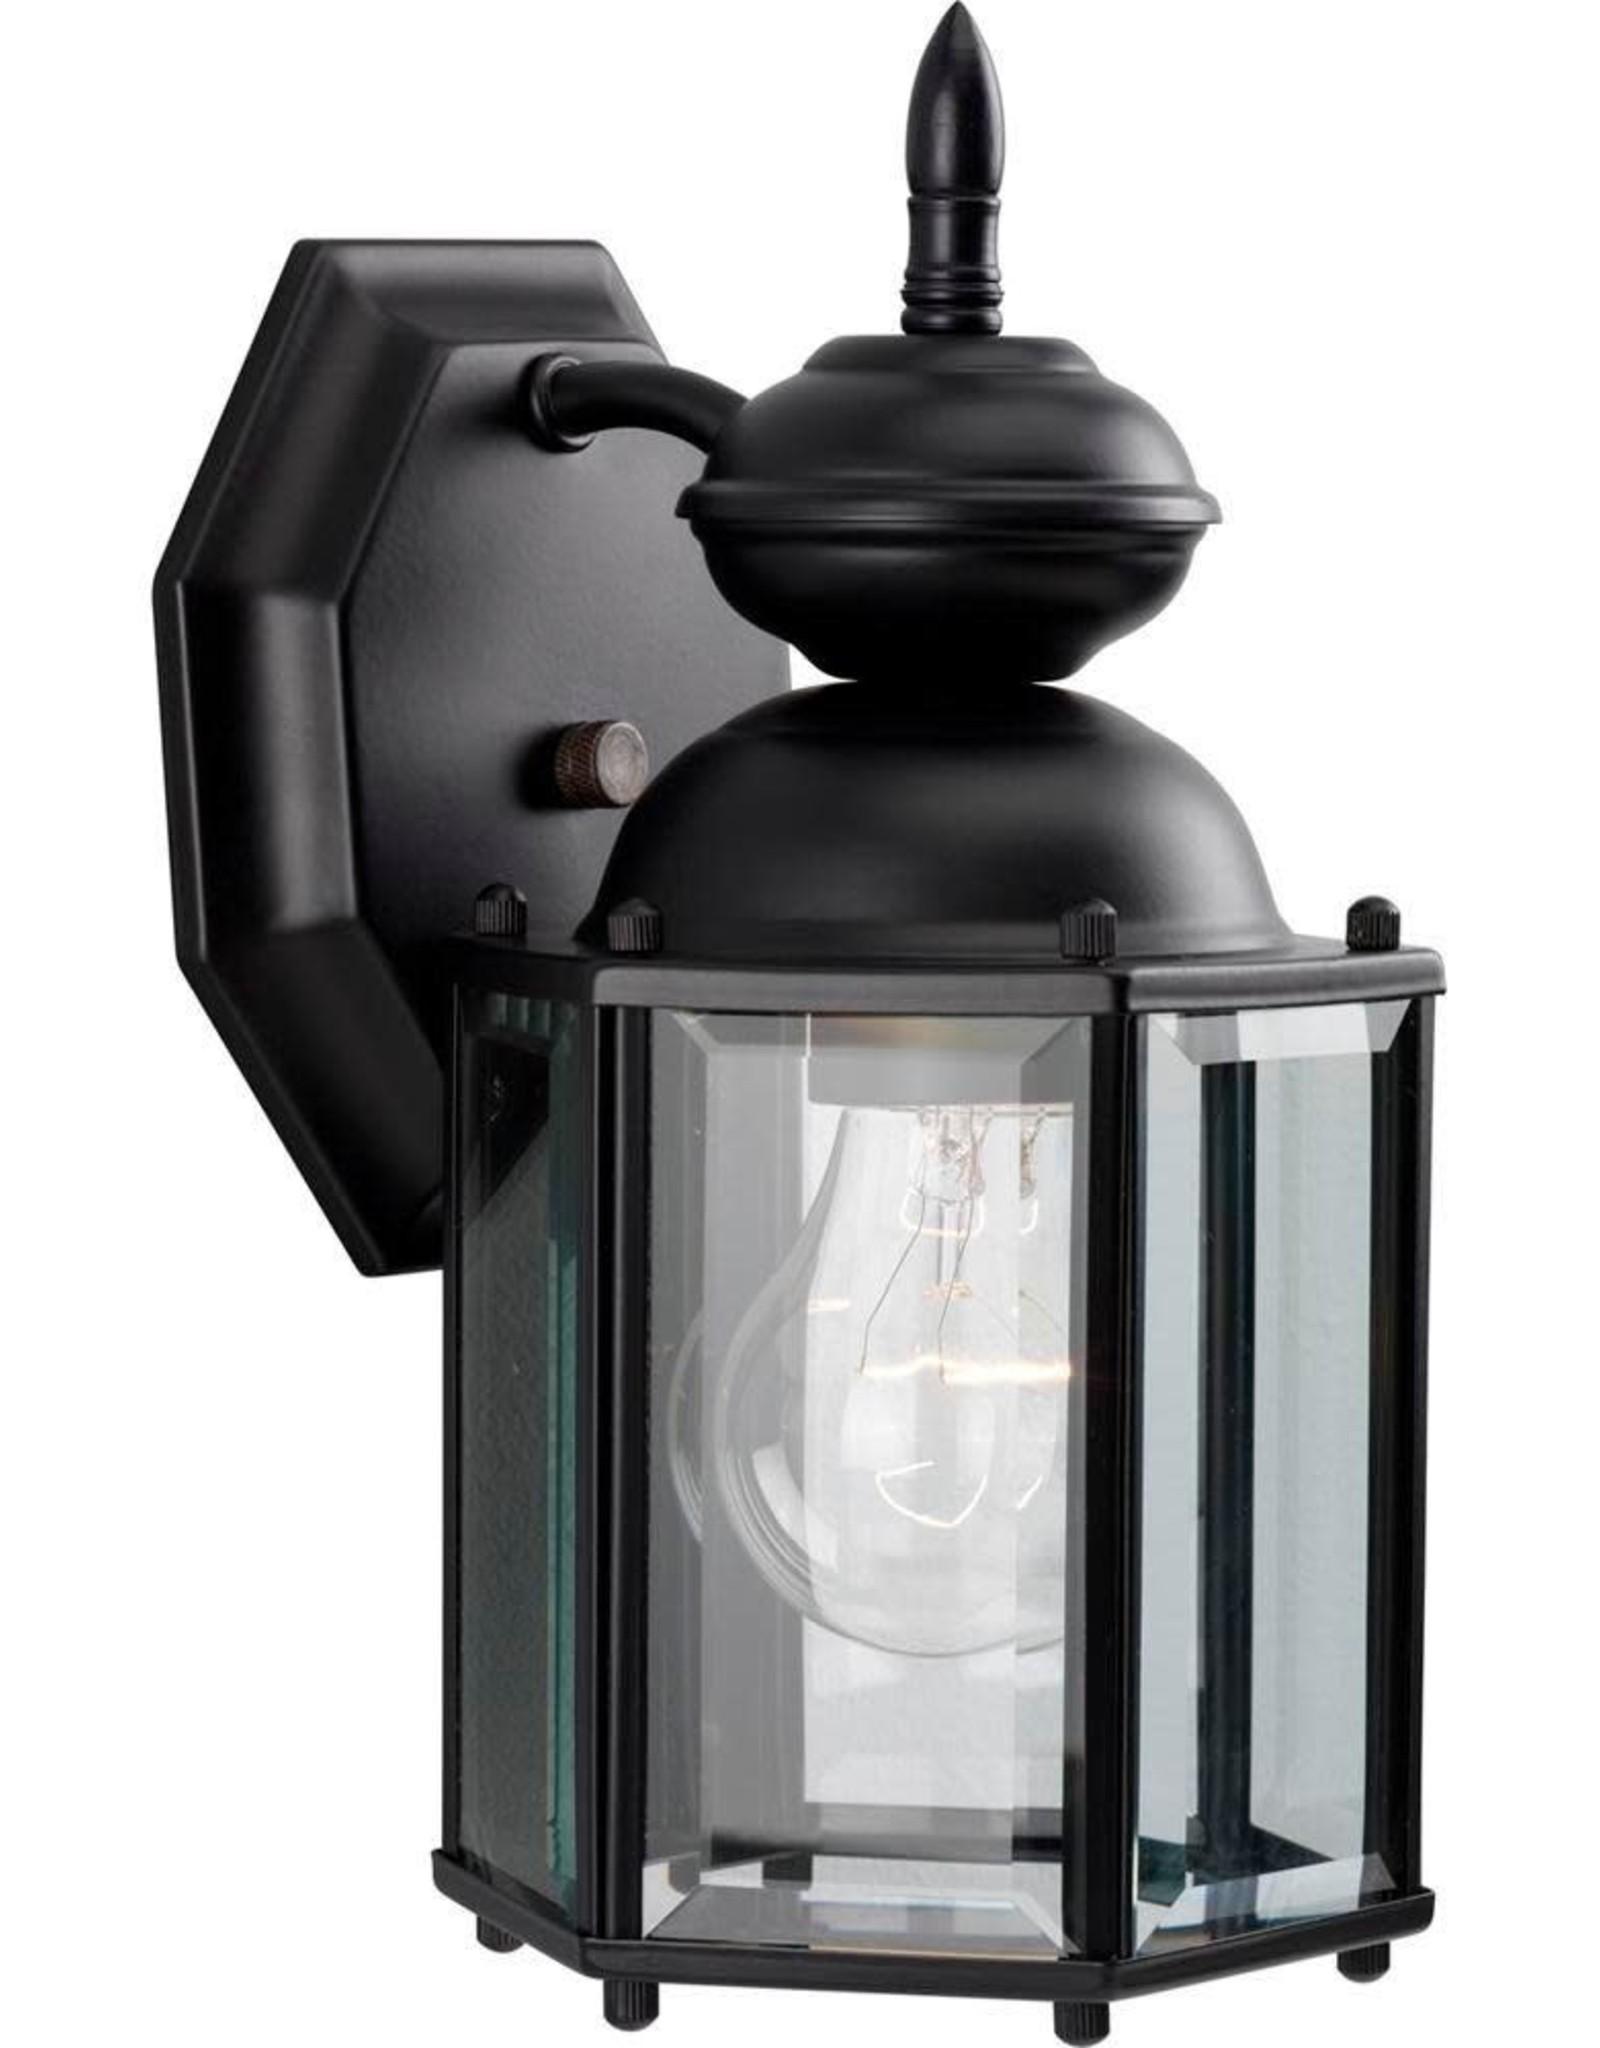 Progress Lighting 1-Light Black 10.25 in. Outdoor Wall Lantern Sconce